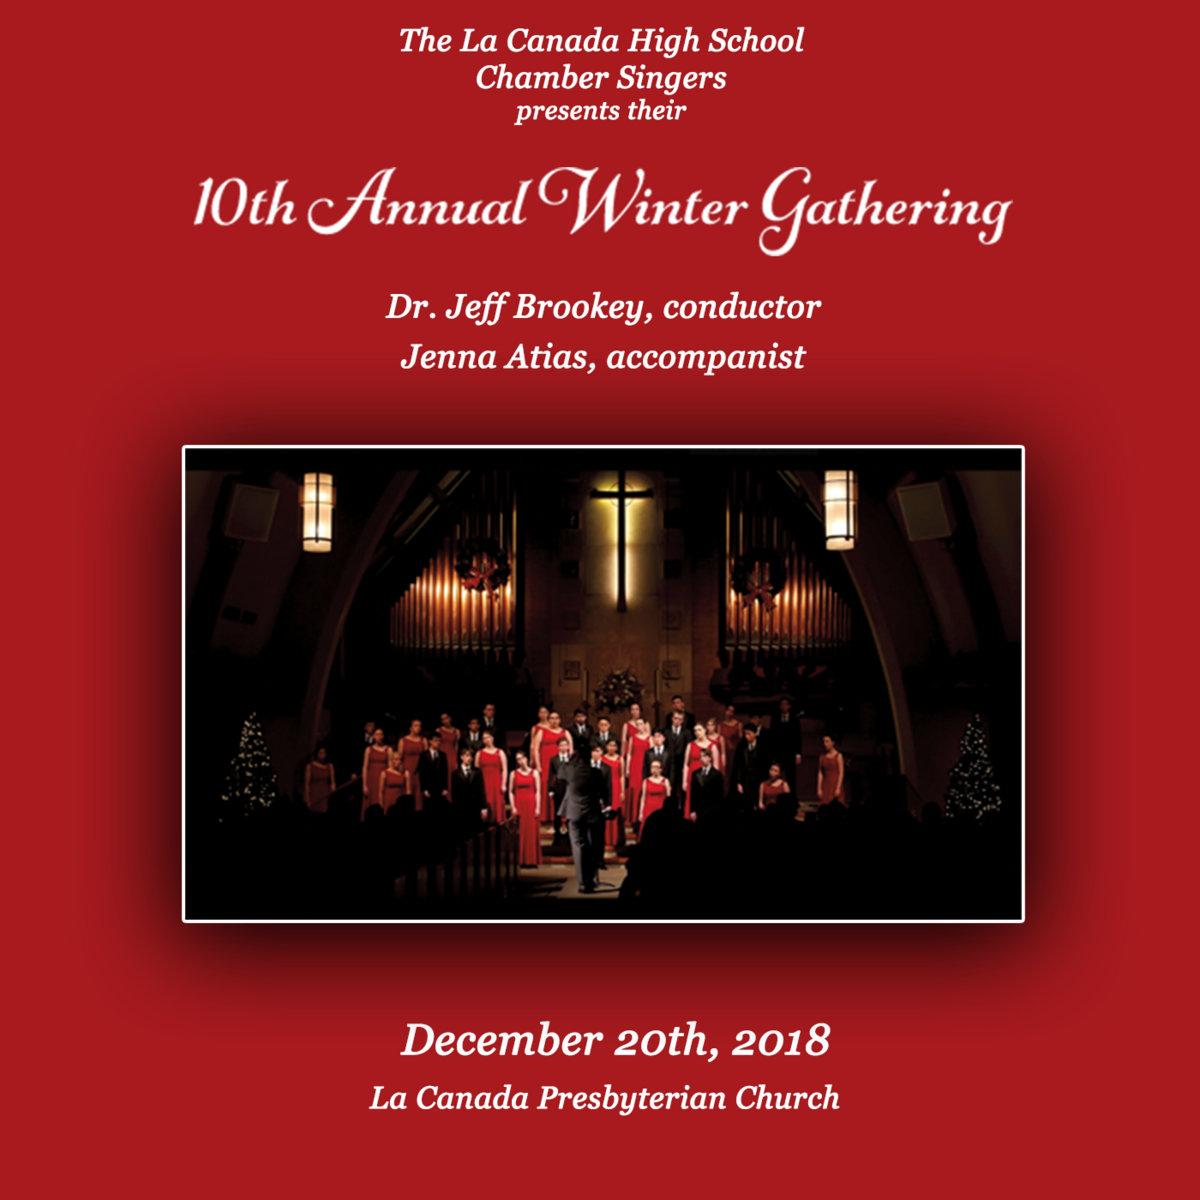 2018-2019 Chamber Winter Gathering | LCHS Choral